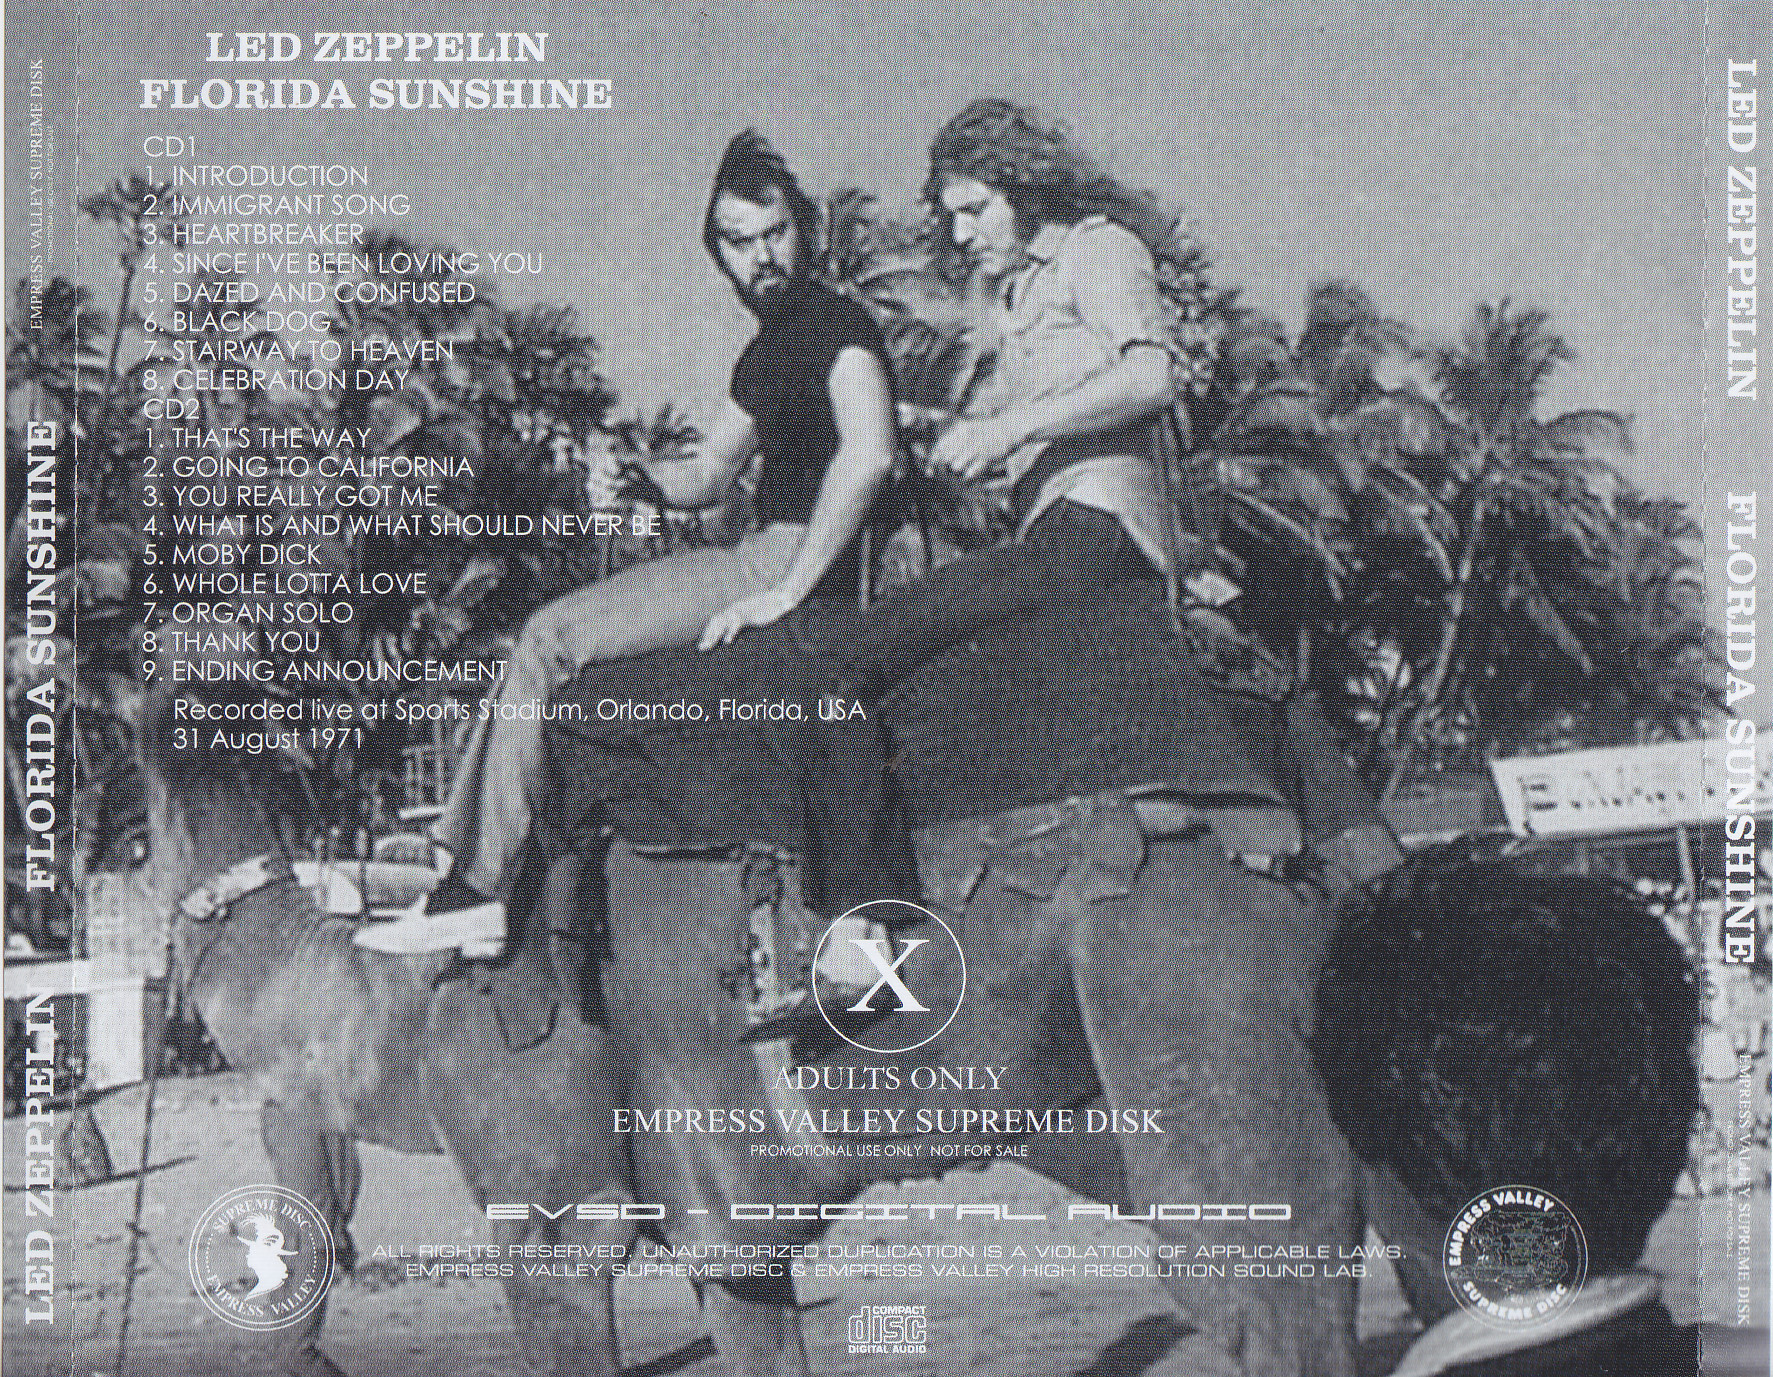 Led Zeppelin / Florida Sunshine / 2CD – GiGinJapan